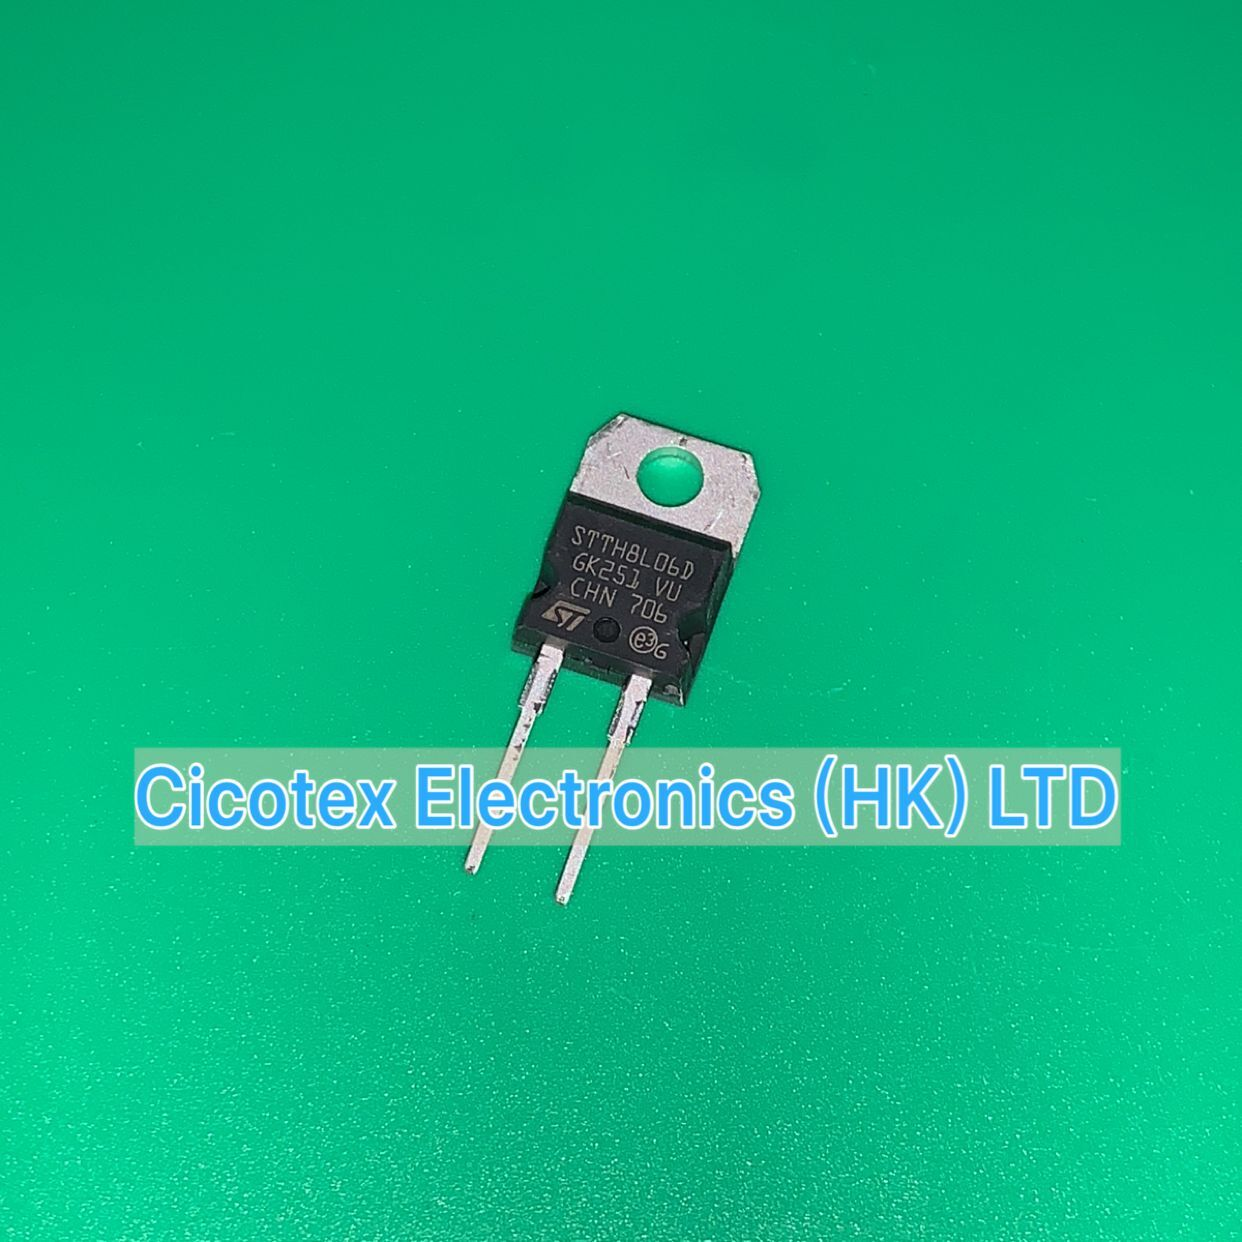 5pcs/lot STTH8L06D IRG TO-220AC STTH 8L06 D DIODE GEN PURP 600V 8A TO220AC STTH8L06DIRG